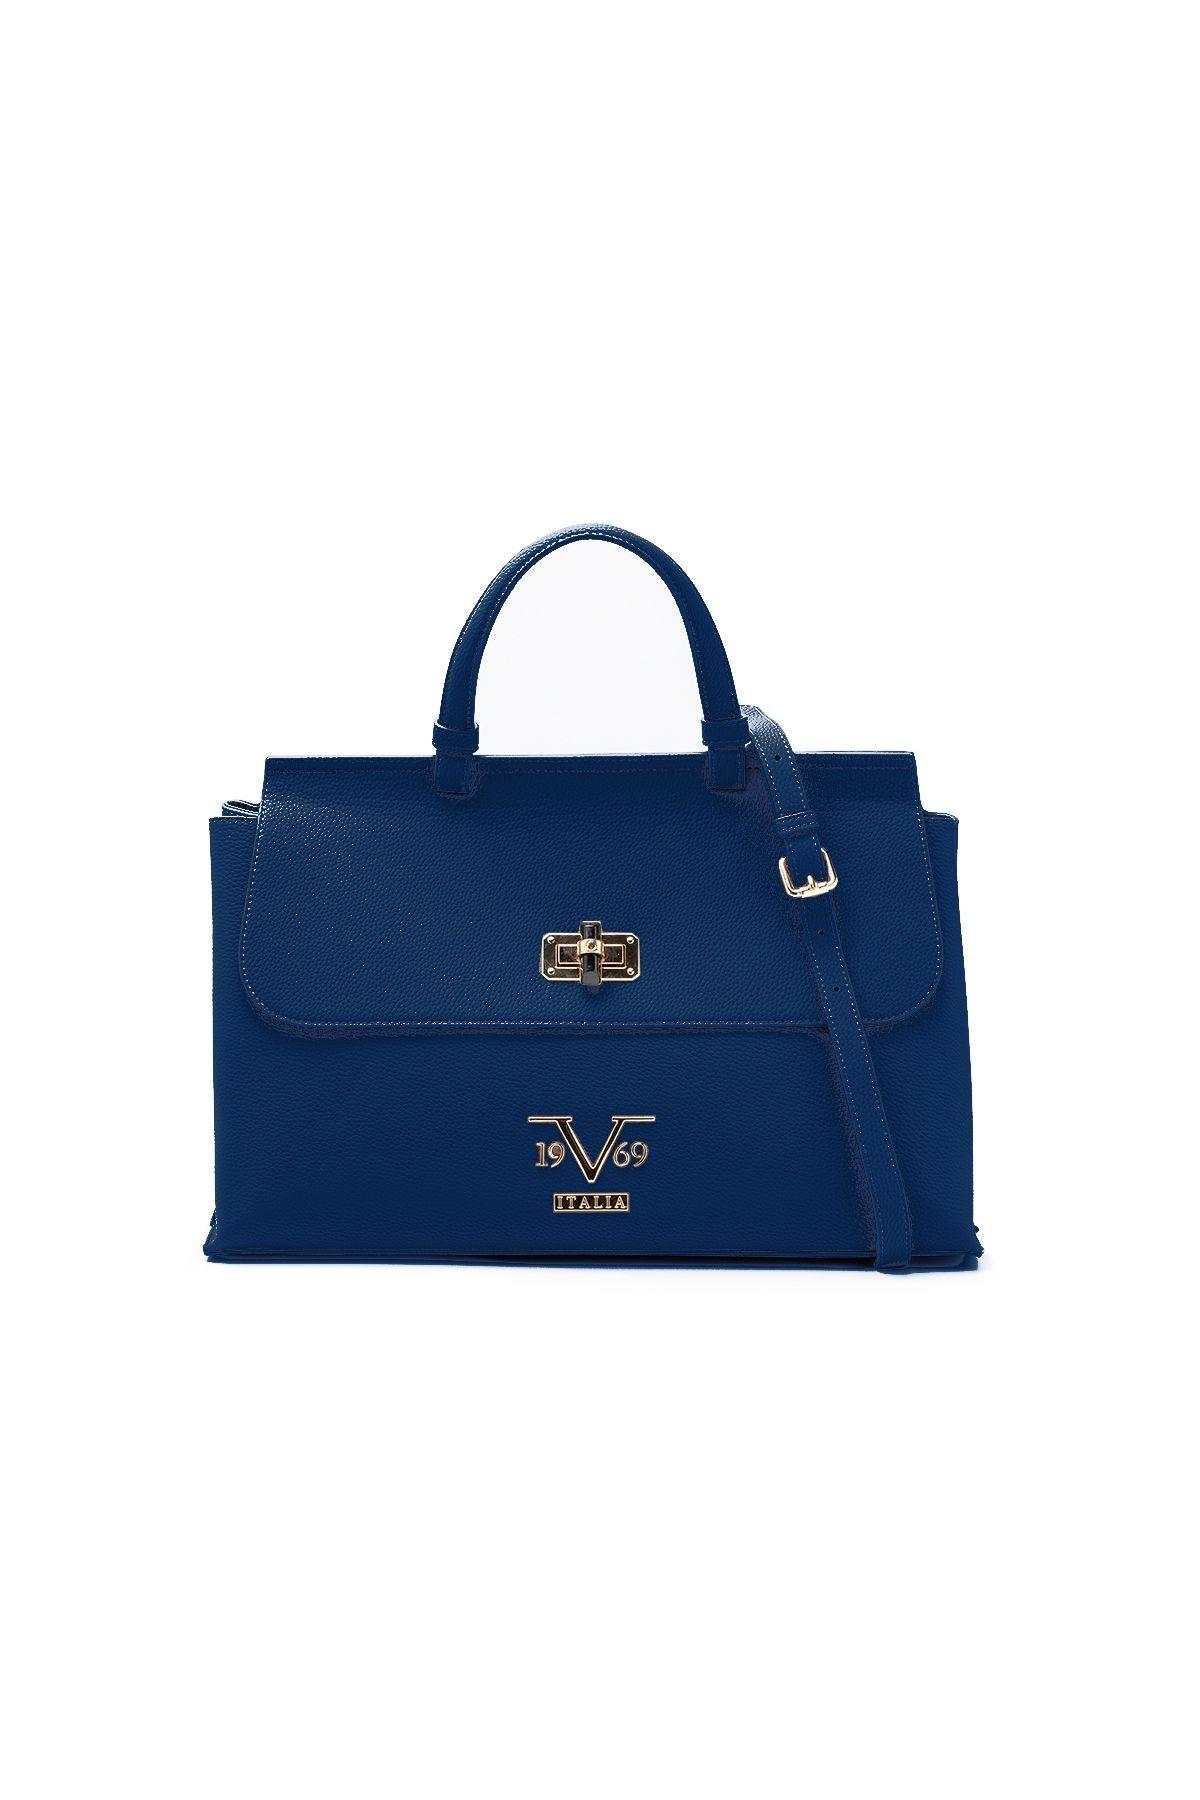 19V69 Italia Women's Bag In Blue